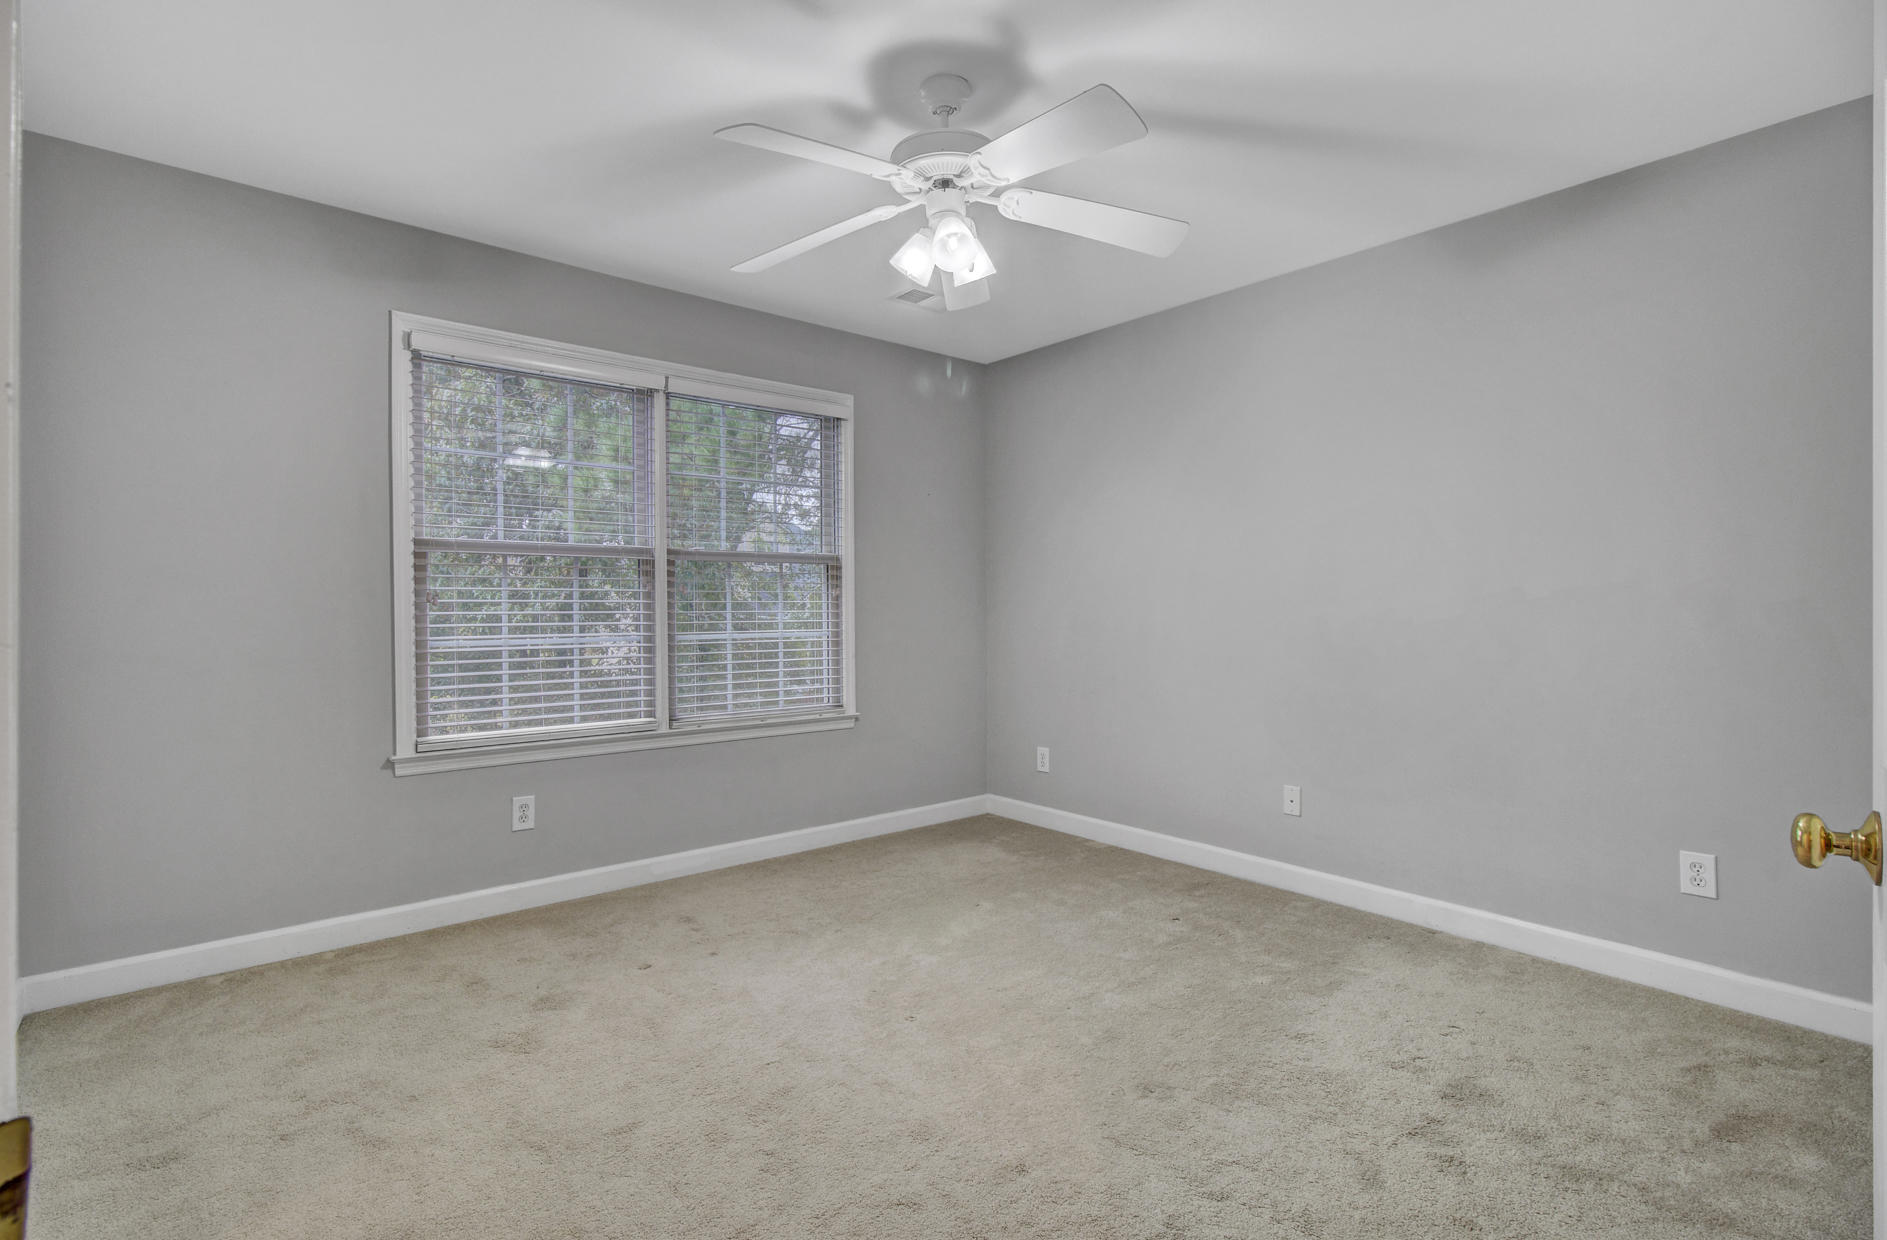 Dunes West Homes For Sale - 2321 Darts Cove, Mount Pleasant, SC - 21